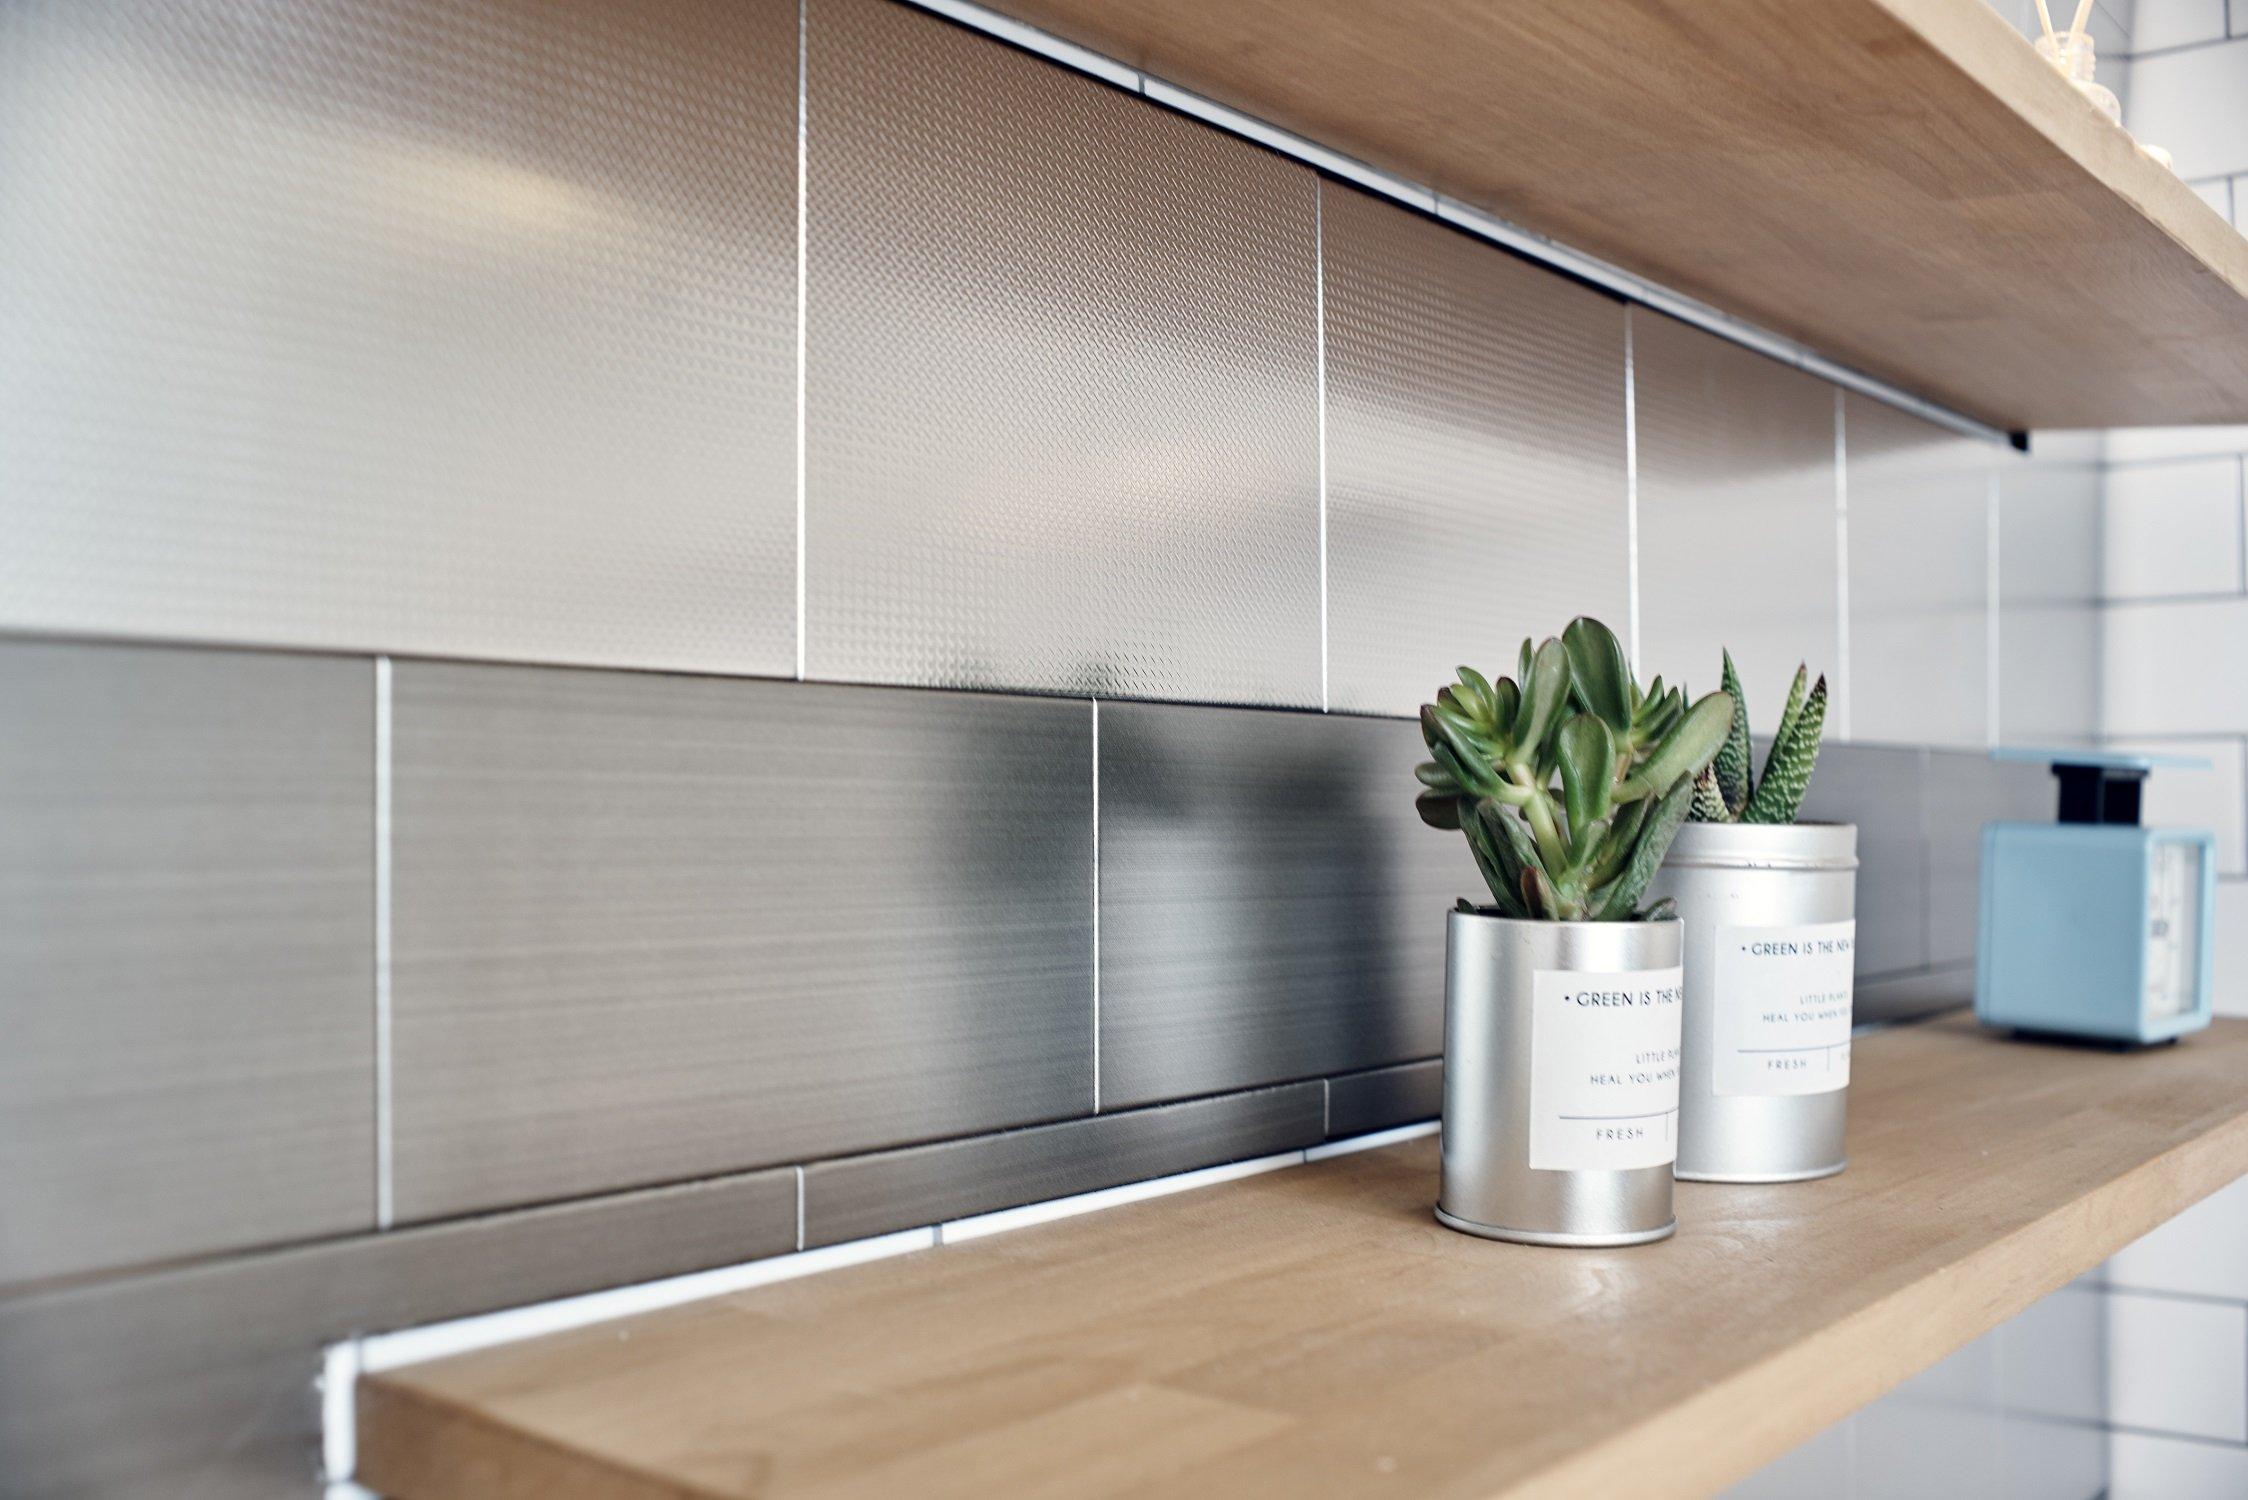 Stainless Steel Home Interior Decor Peel and Stick Sticker Fire Retardant Backsplash Kitchen DIY Check Silver (10cm x 20cm 4pcs)